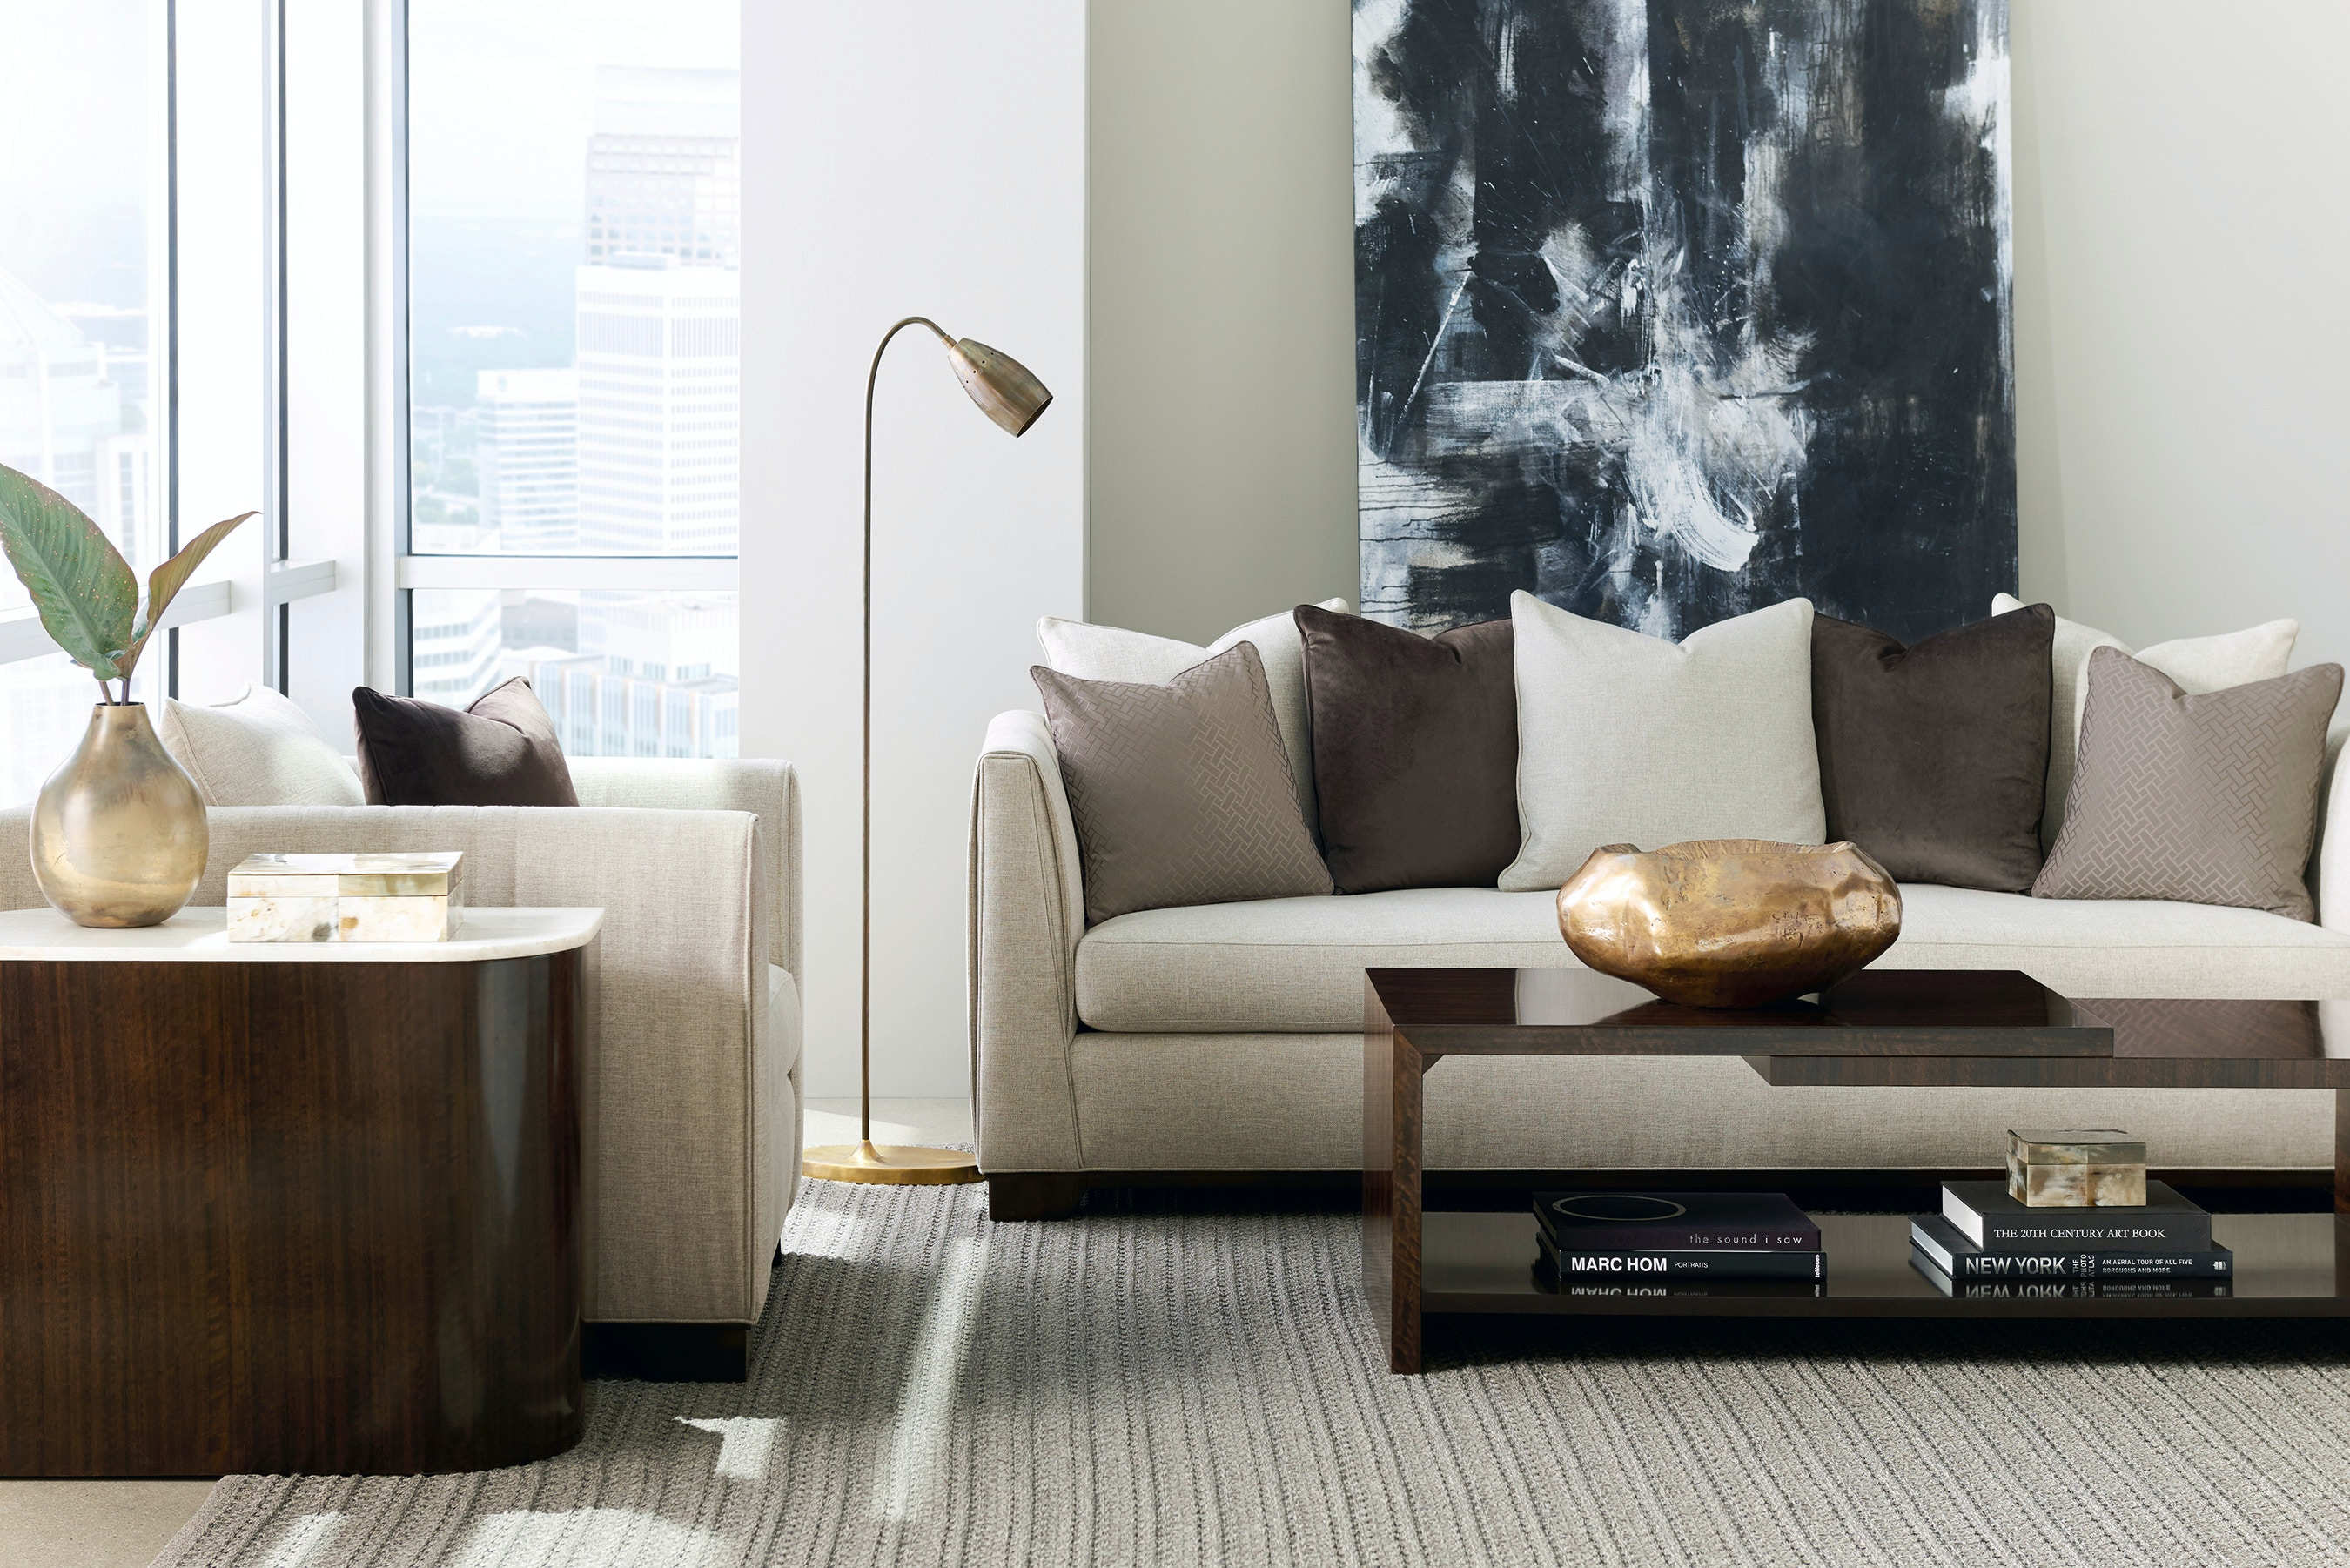 Gentil Caracole Modern Moderne Sofa M020 417 012 A